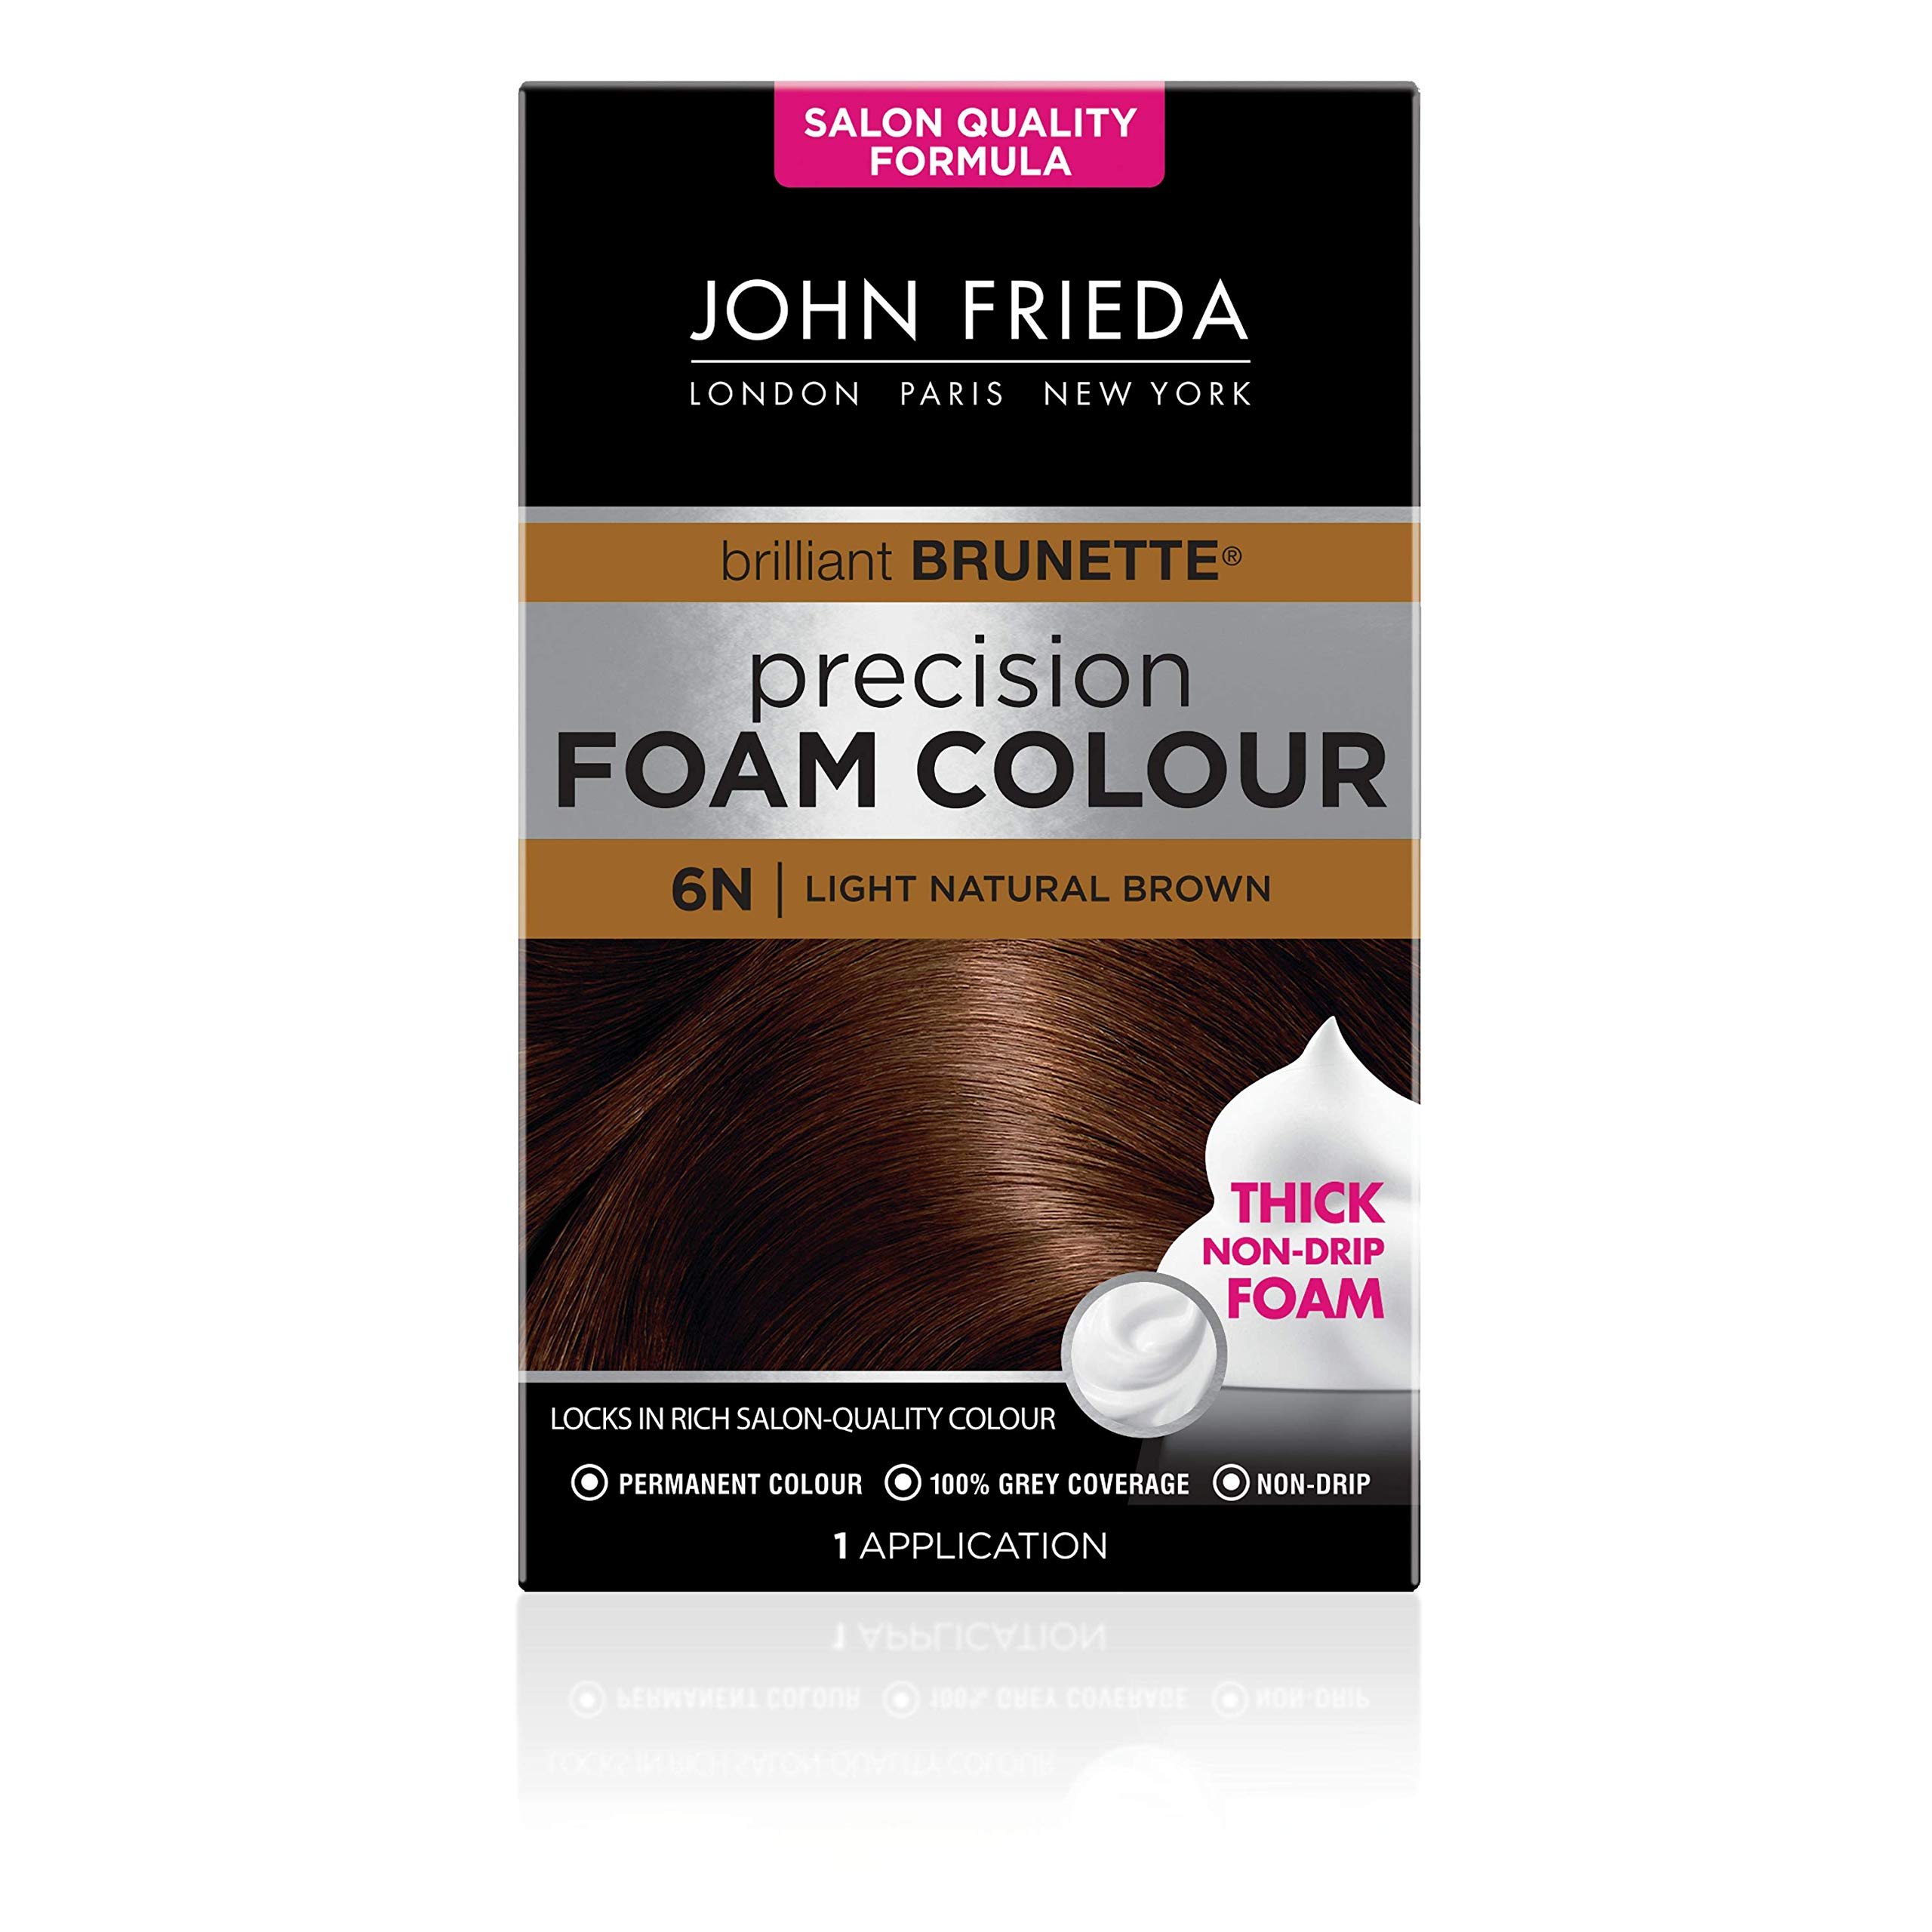 John Frieda Precision Foam Colour Permanent Hair Dye, Number 6N, Light Natural Brown